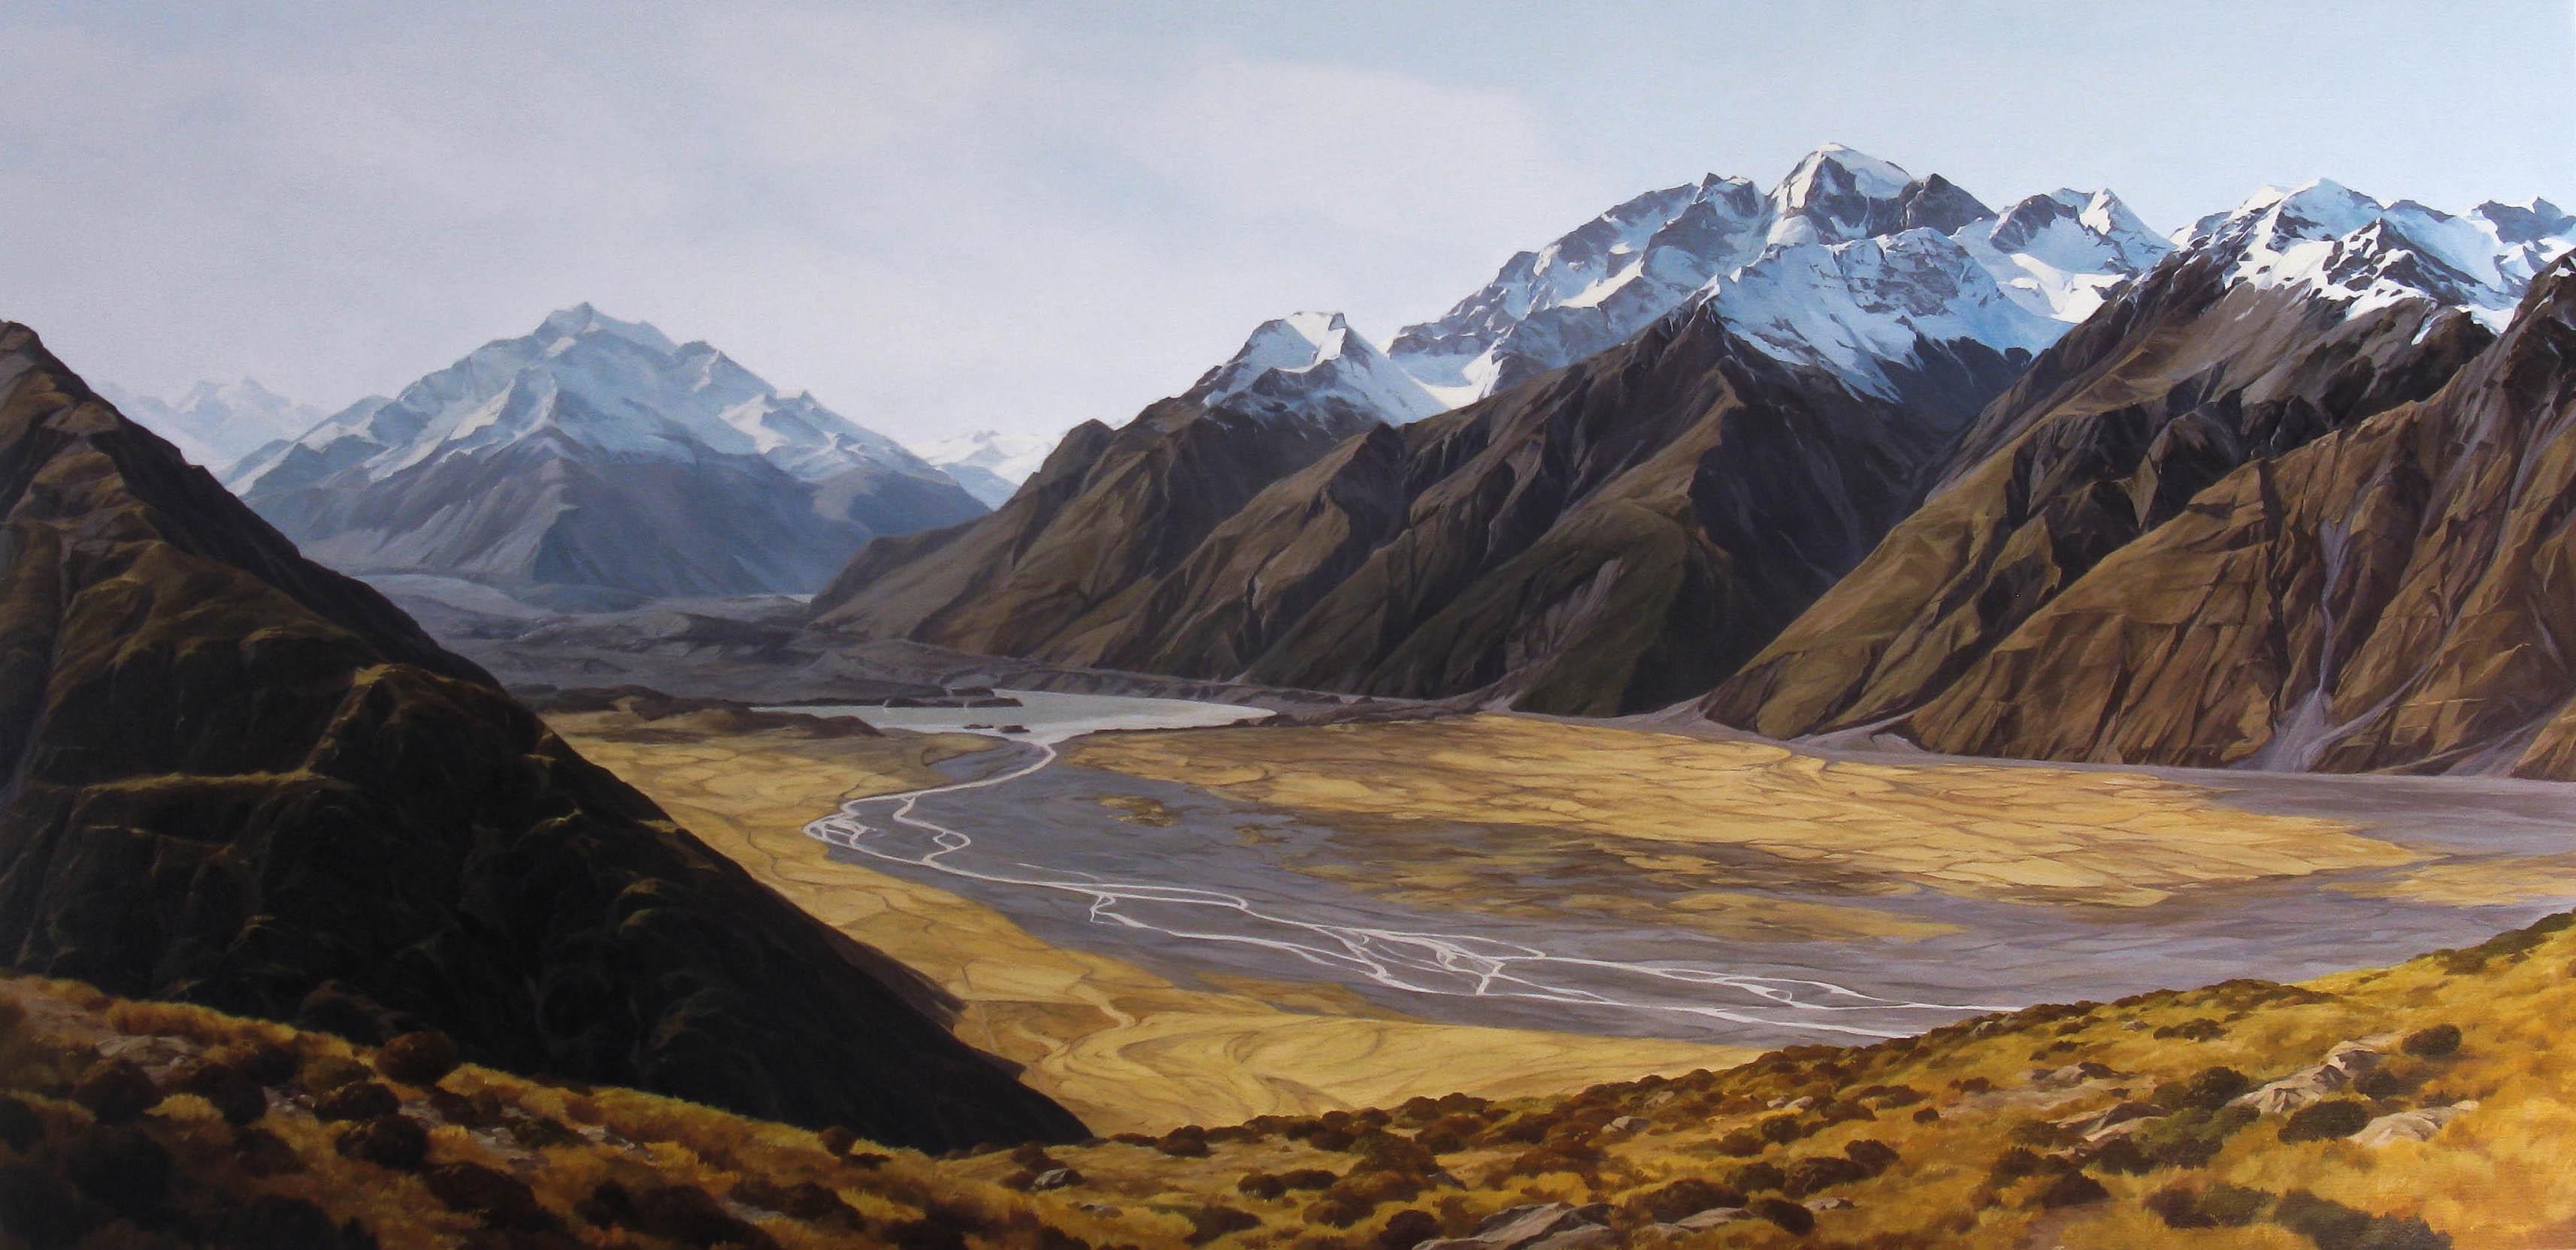 Tasman Valley, Aoraki Mount Cook